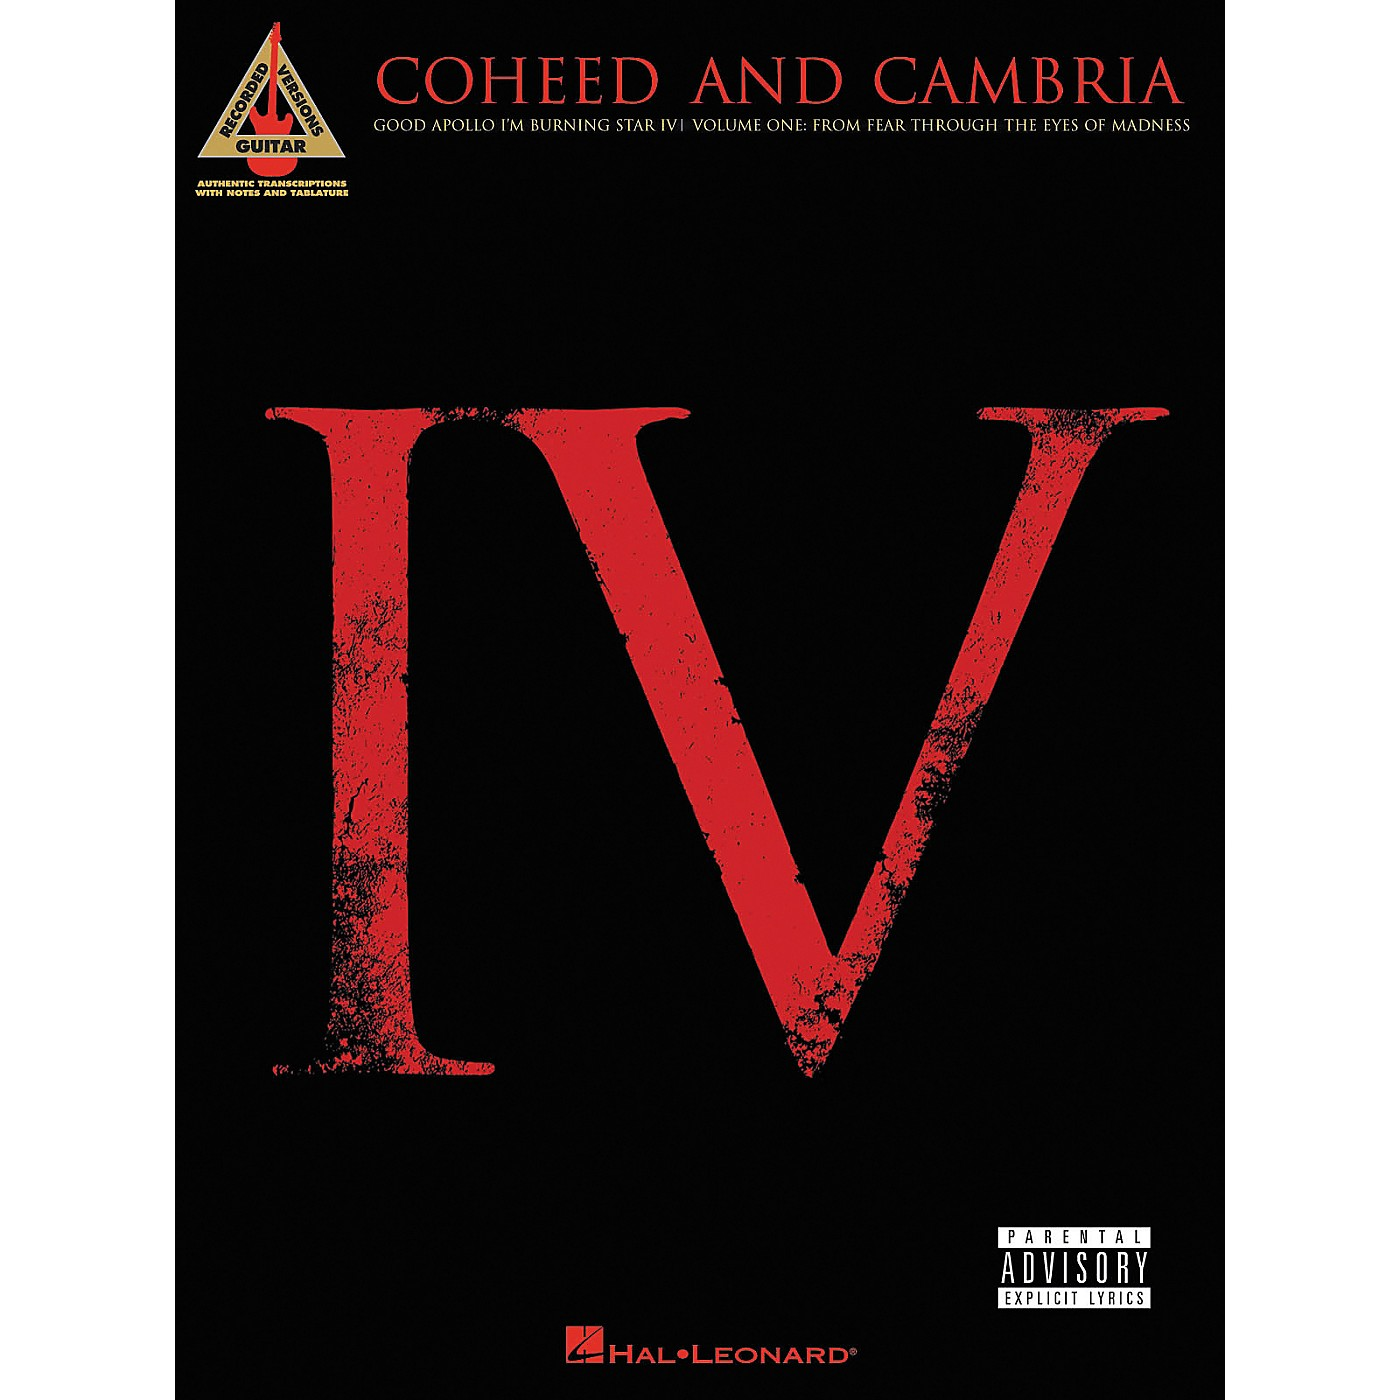 Hal Leonard Coheed and Cambria Good Apollo I'm Burning Star IV Volume 1 Guitar Tab Songbook thumbnail